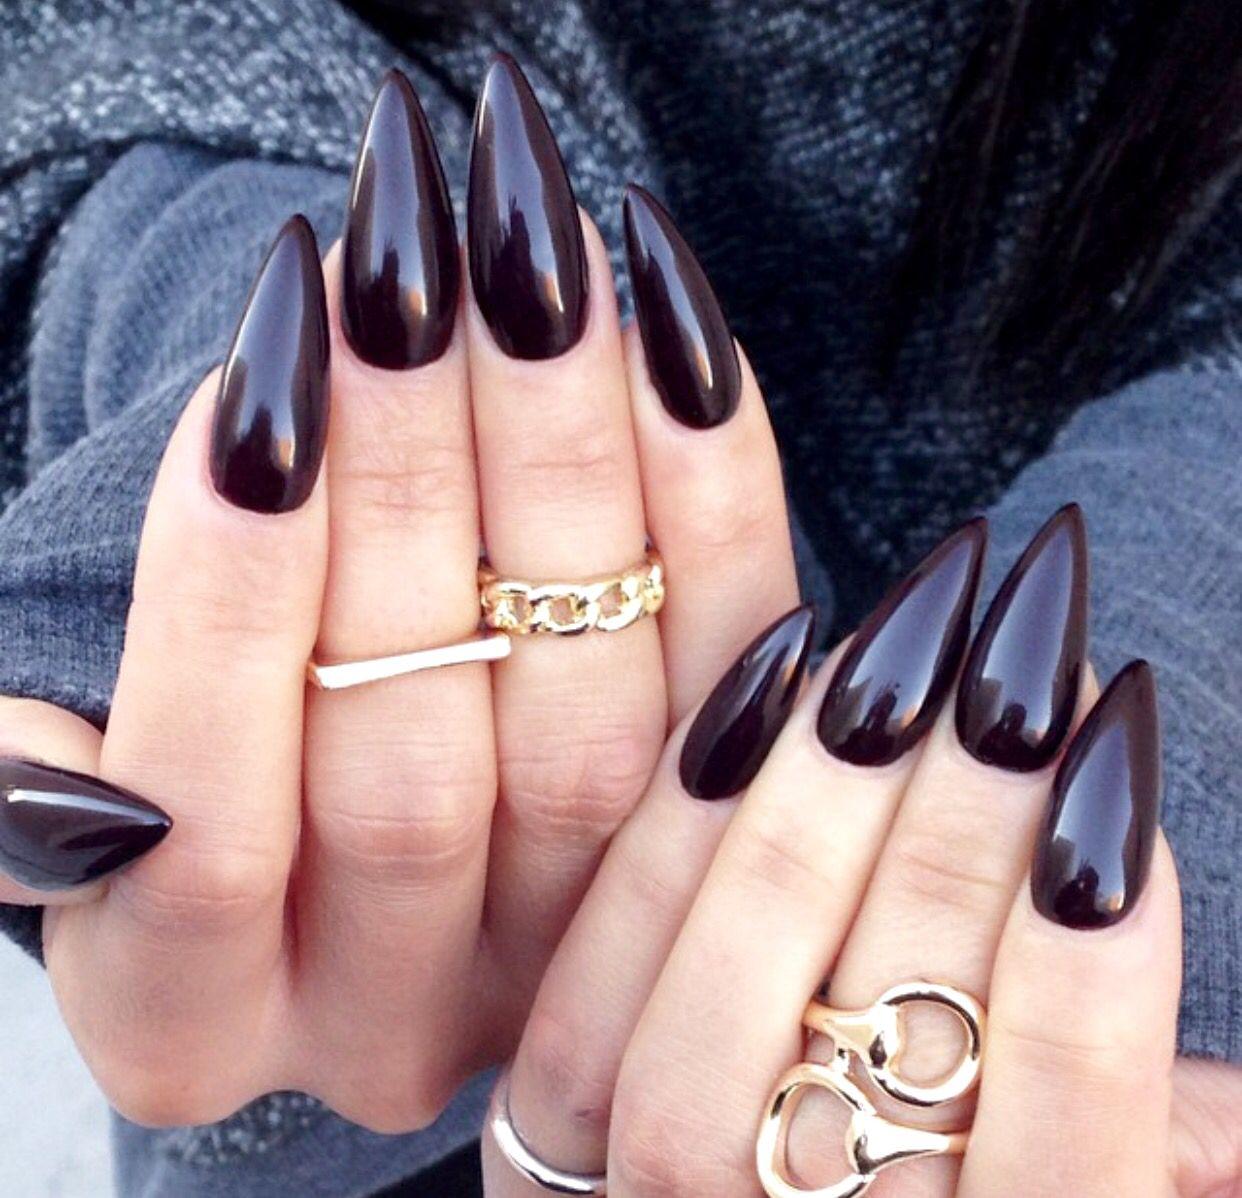 Dark Red Stiletto nails | 1. Double Team + Dynamicpunch Amazing ...